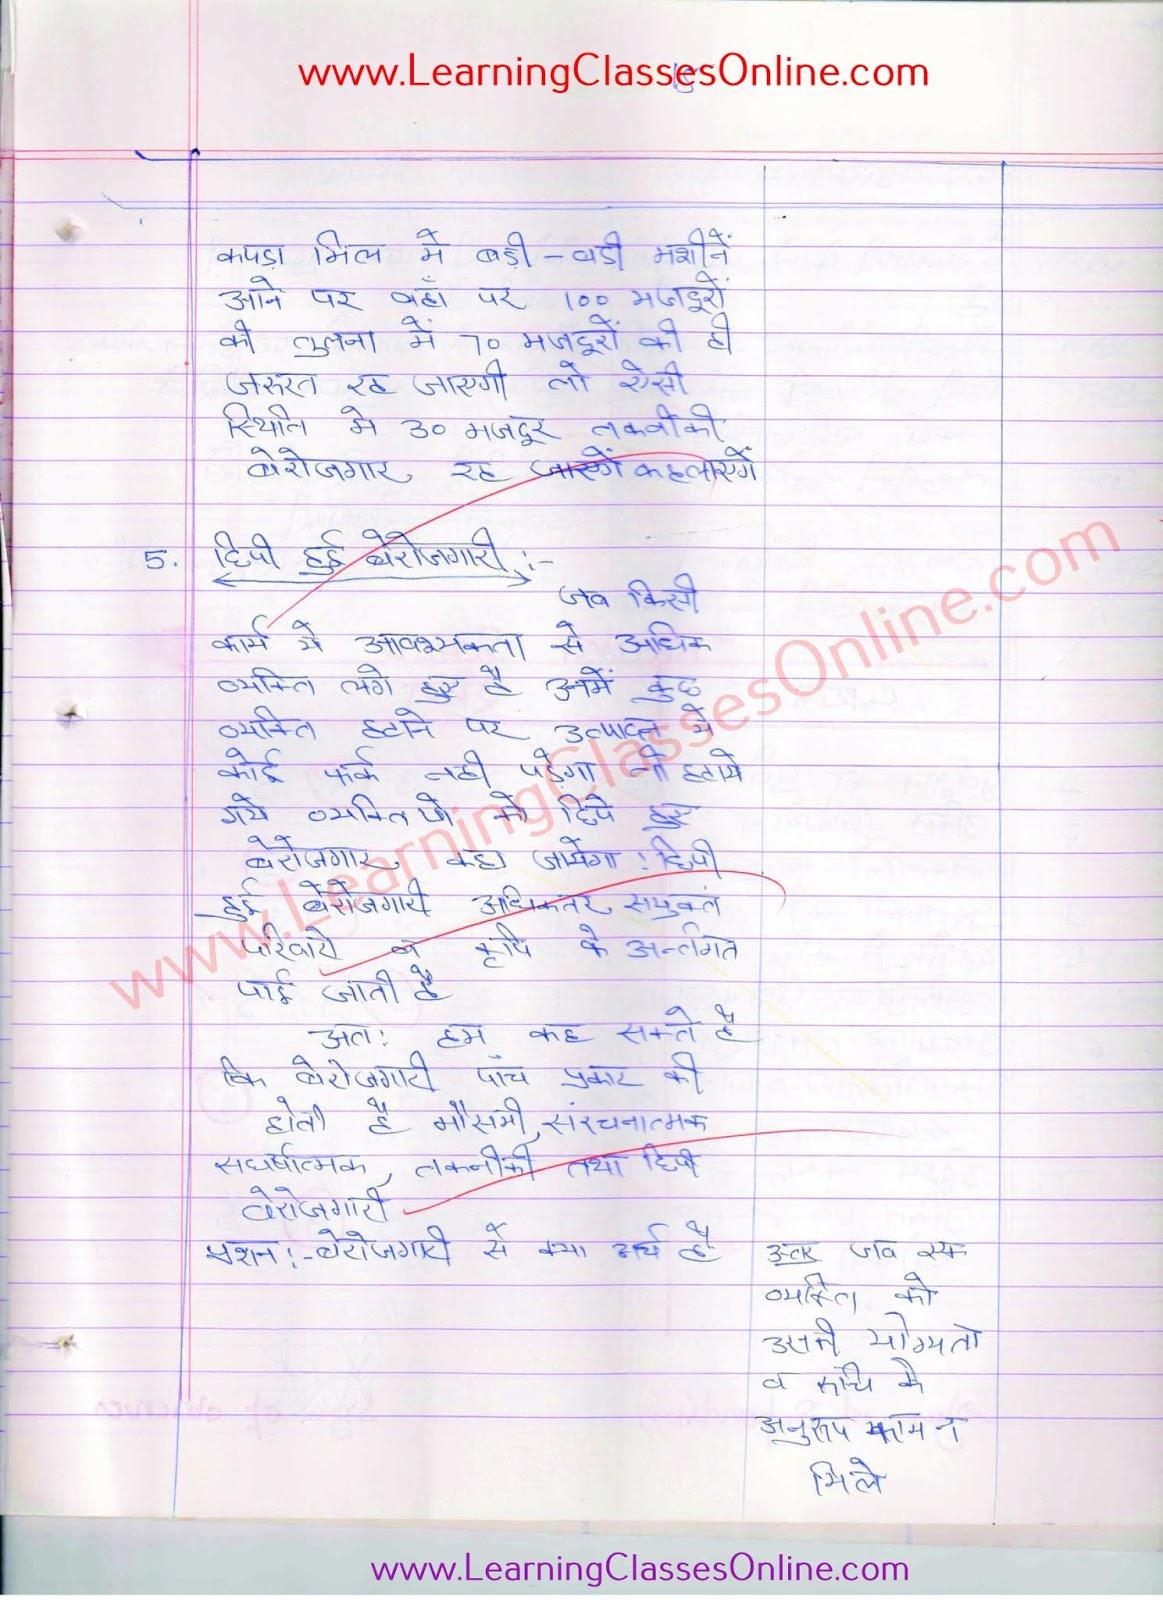 economics lesson plan file b.ed, skill of explanation ( vyakhyan kaushal paath yojana